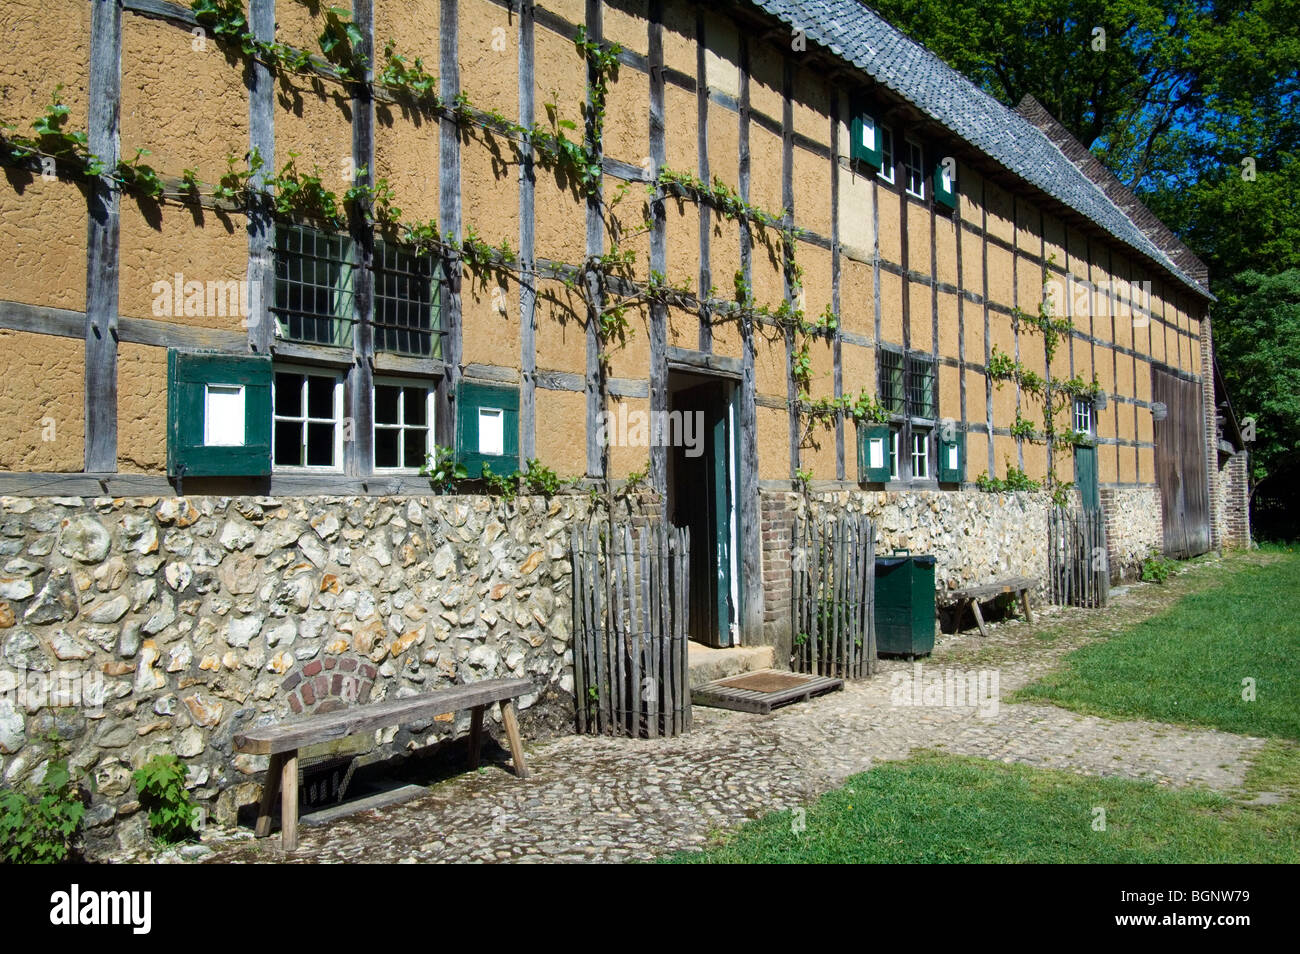 Traditional farmhouse at the open air museum Bokrijk, Belgium - Stock Image